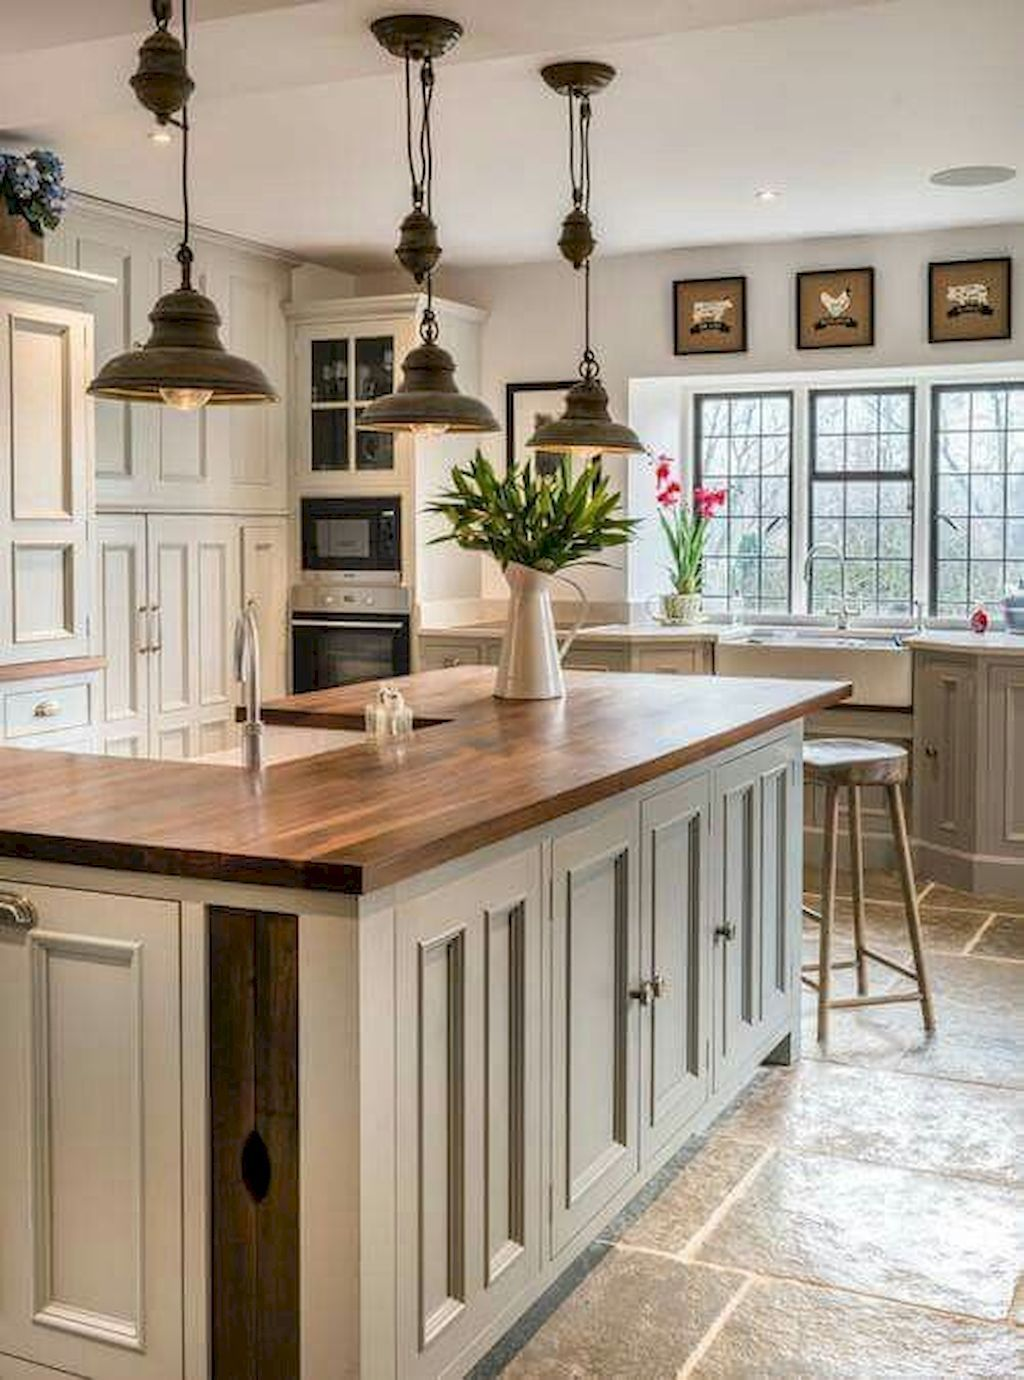 nice 40 rustic modern farmhouse kitchen design ideas https lovelyving com 2017 09 06 40 r on kitchen decor pitchers carafes id=32417